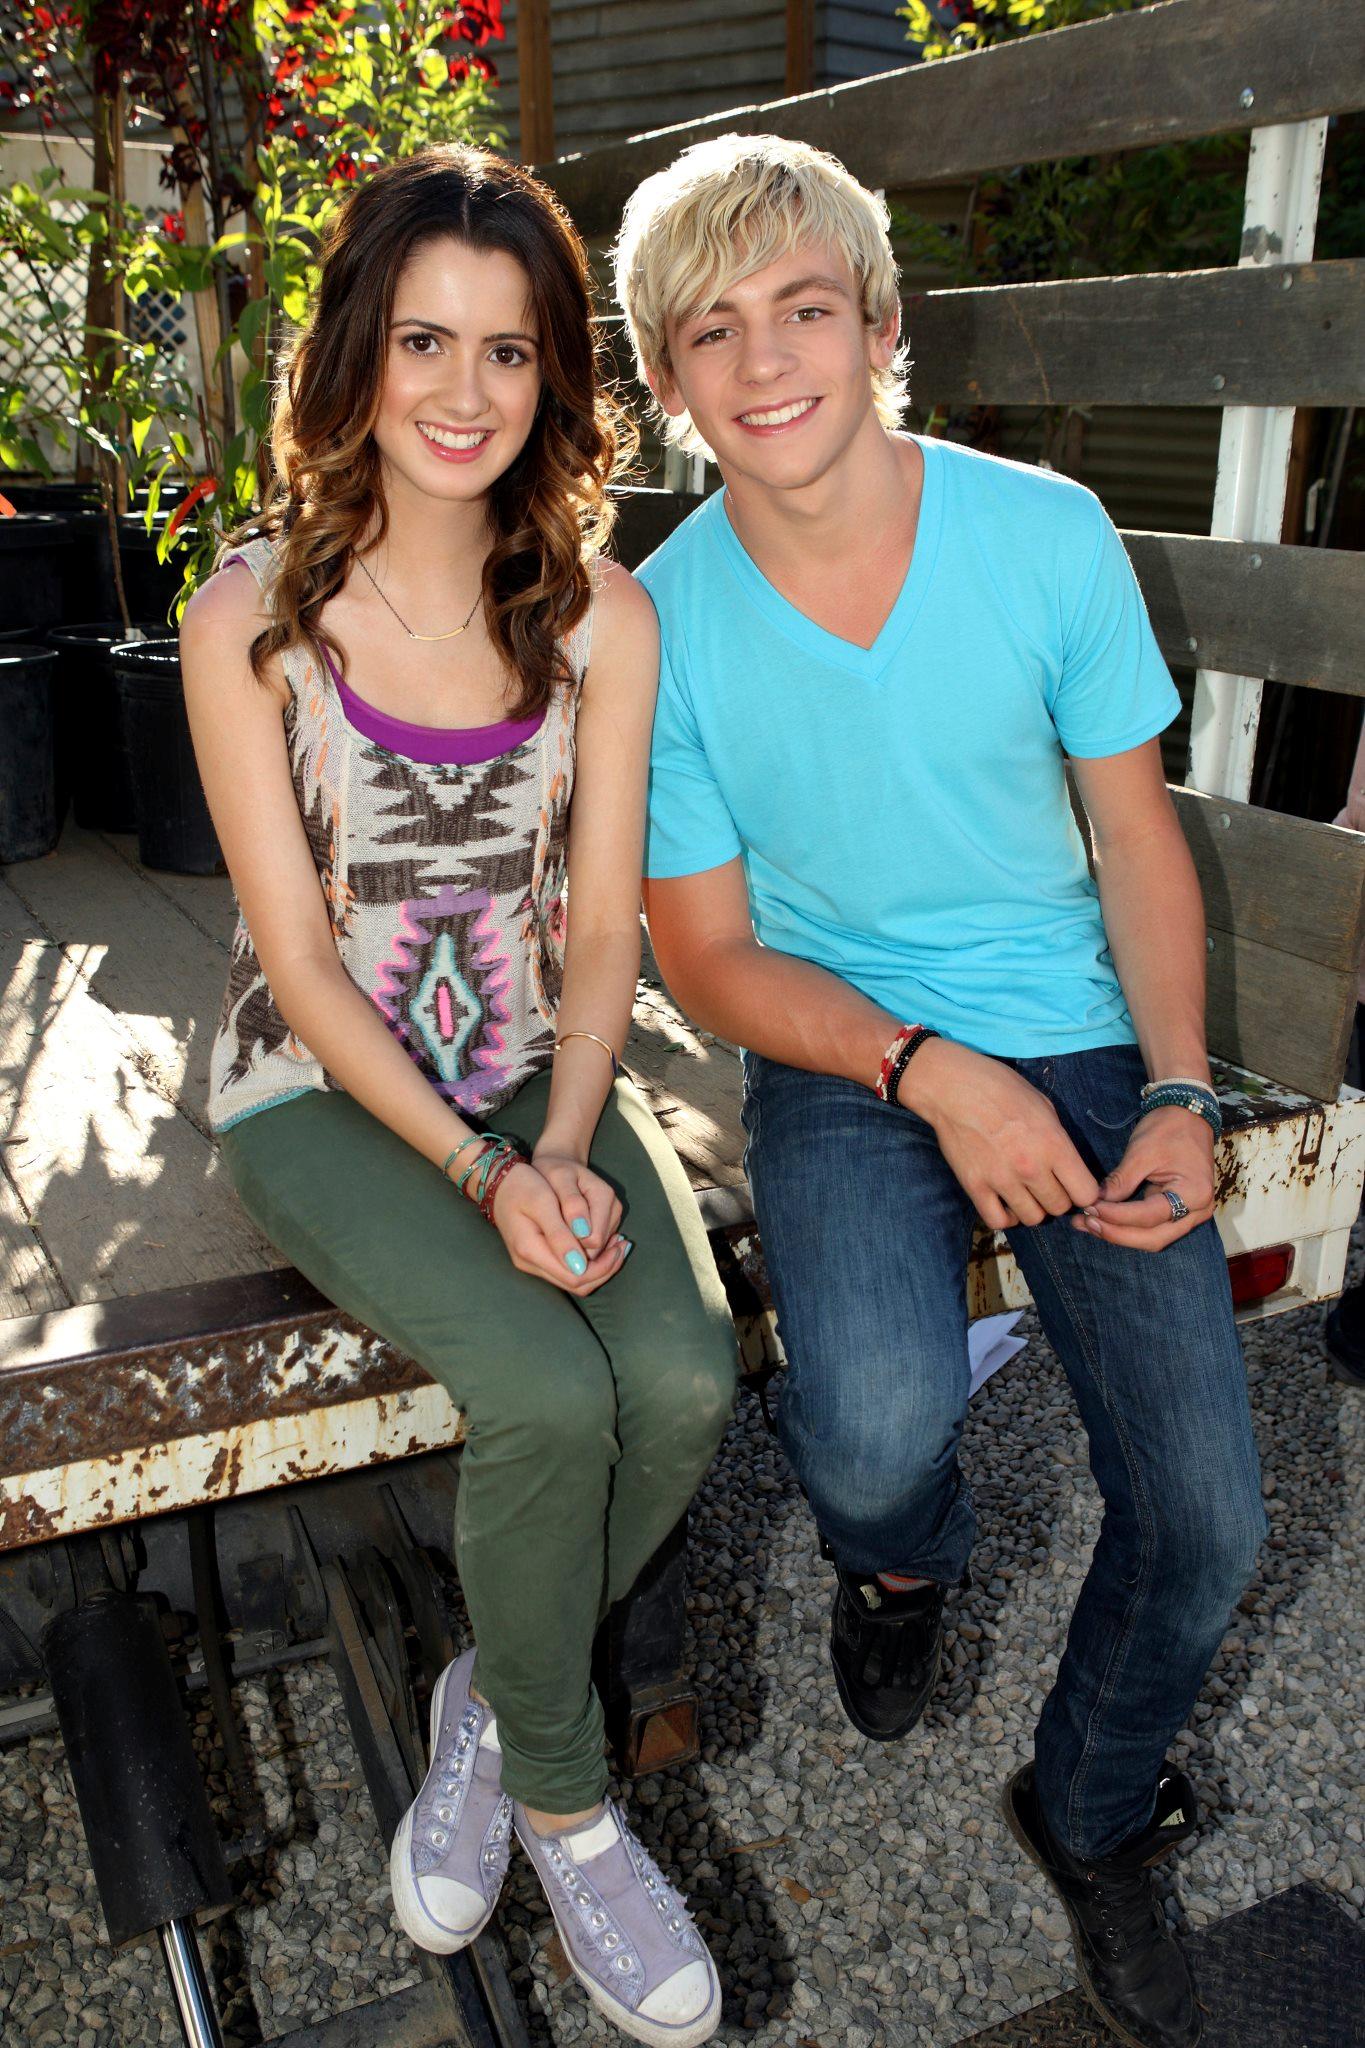 Ross e Laura fanfiction dating